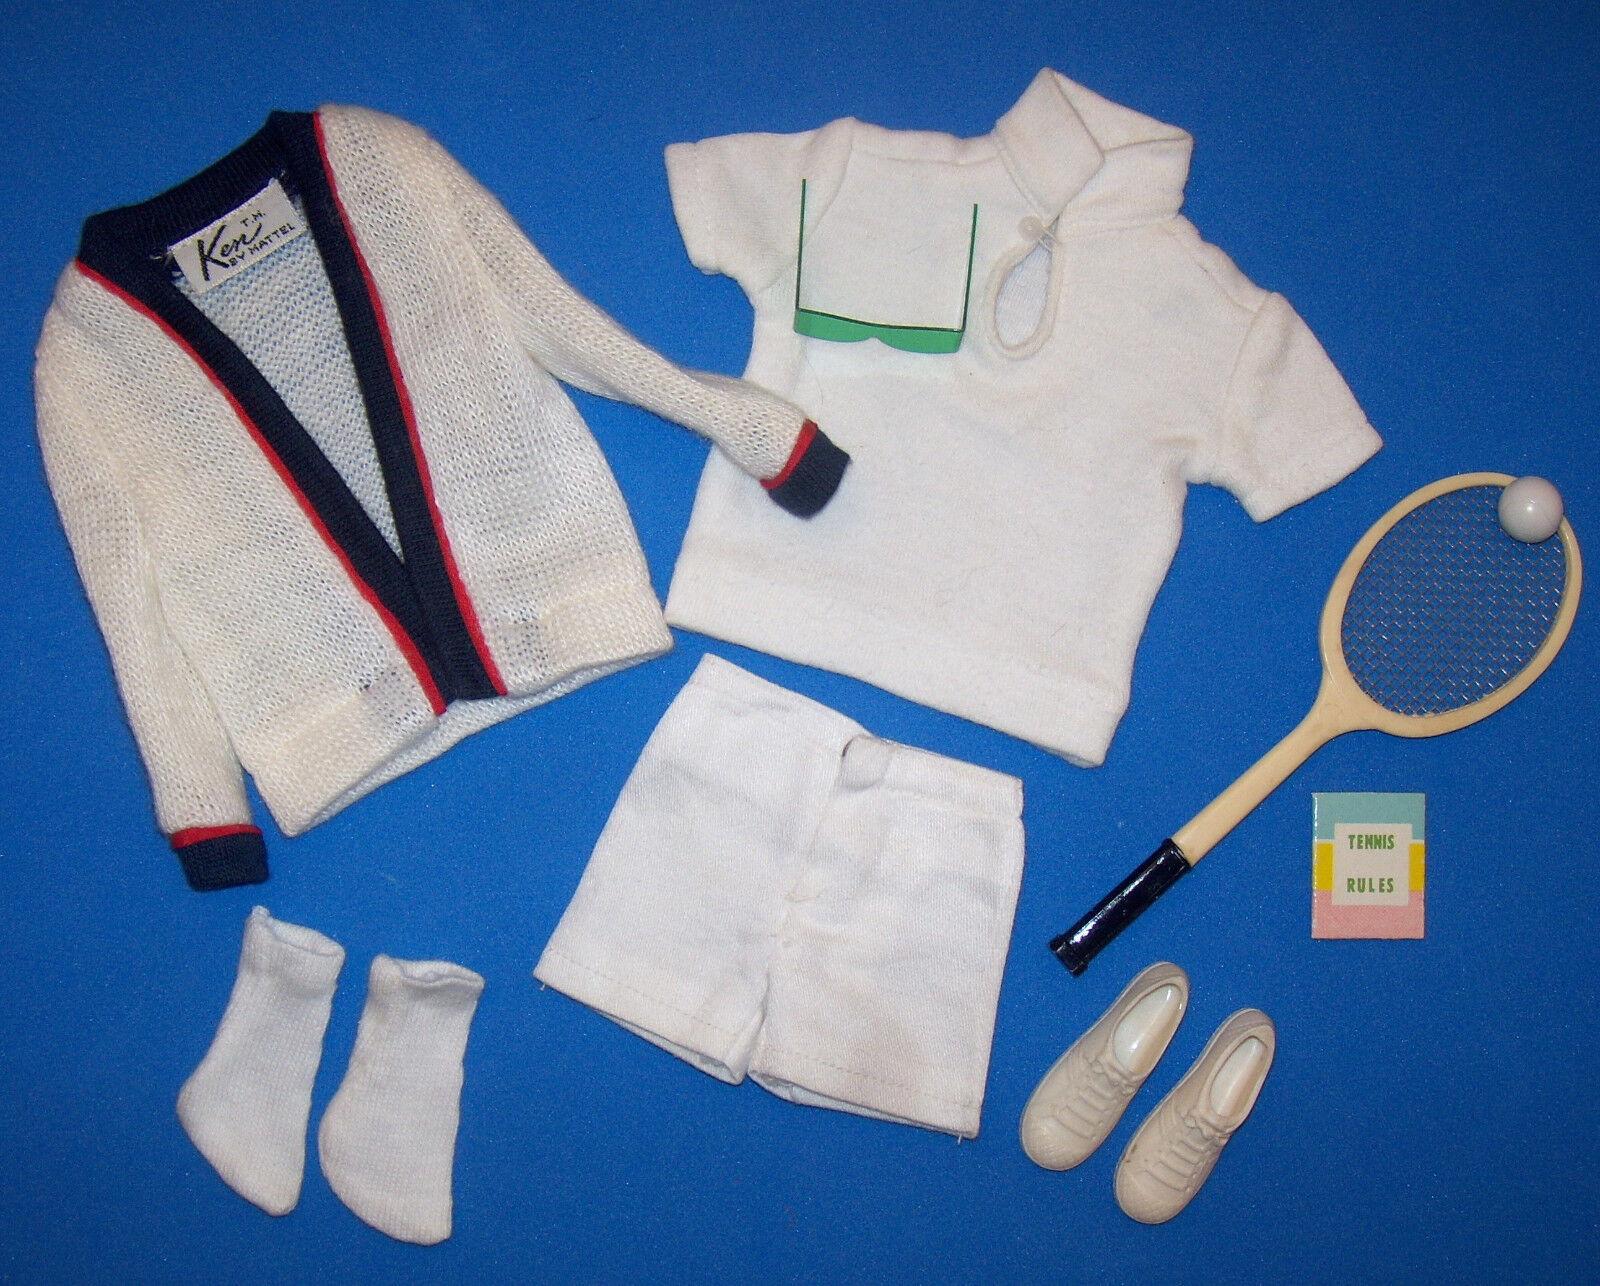 Vintage Ken Time For Tennis  790 Komplettes Outfit Schläger Ball Buch Grün